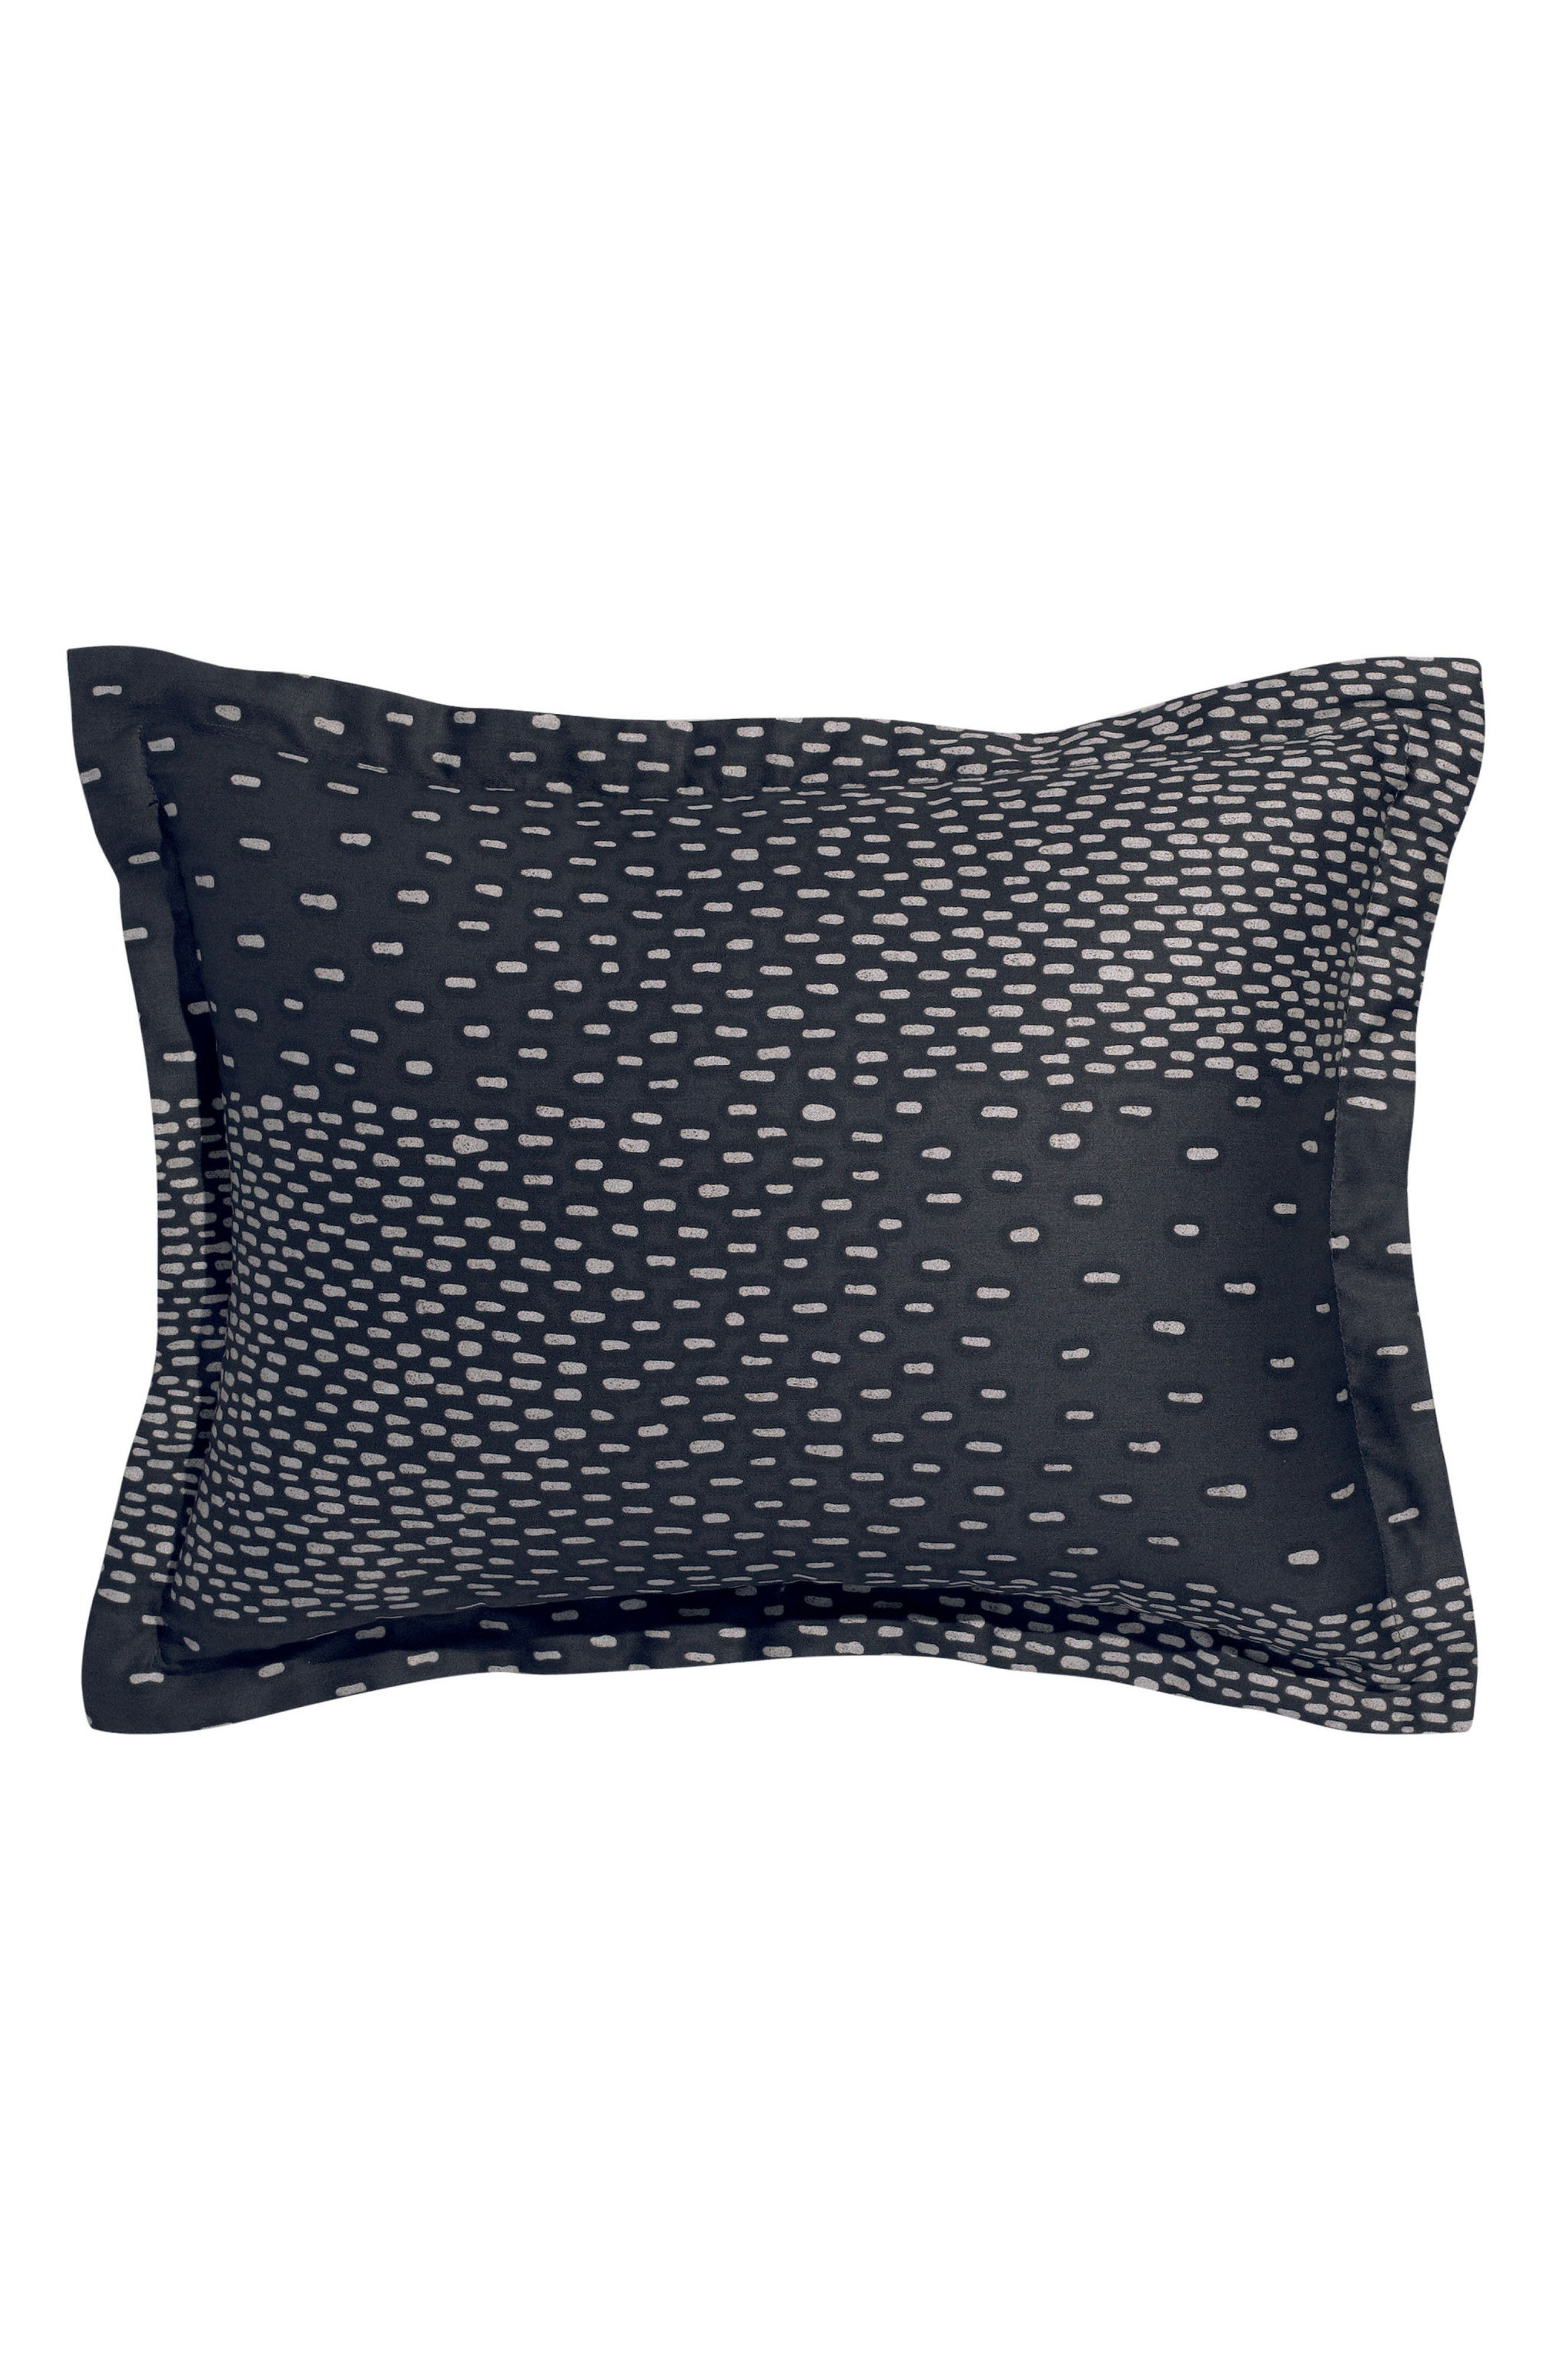 Alternate Image 1 Selected - Portico Nova Sky Accent Pillow